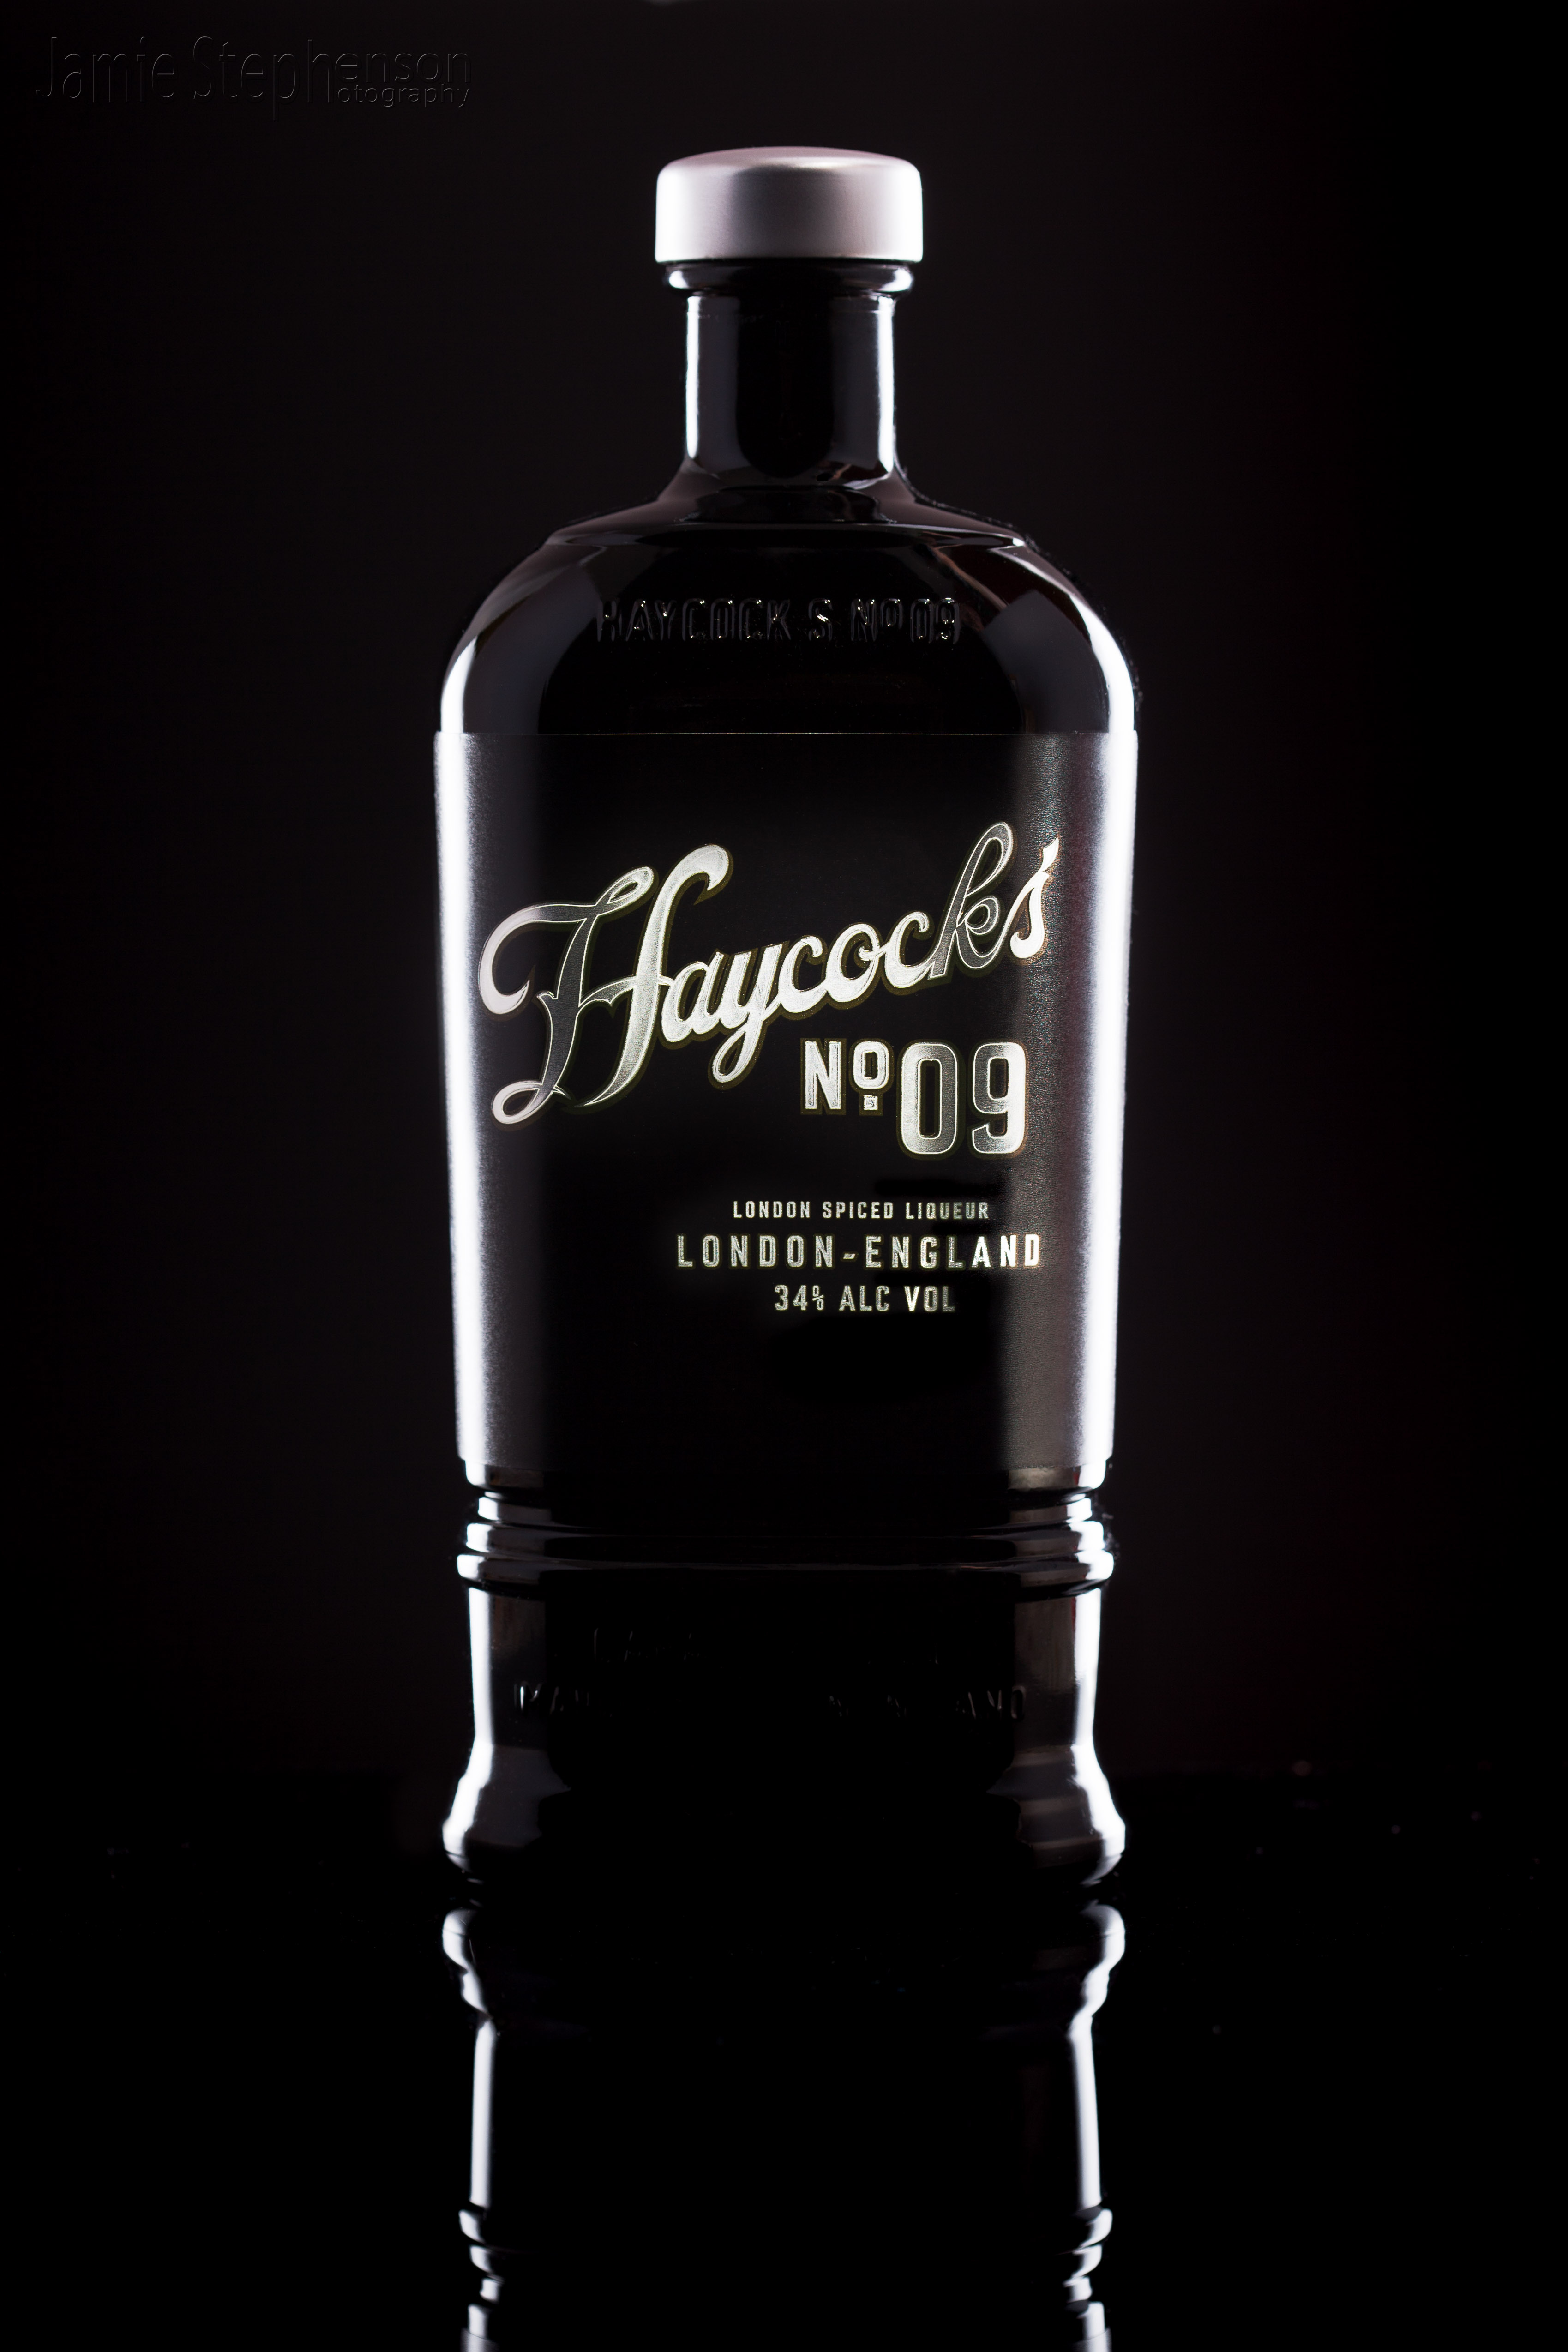 Haycocks.jpg